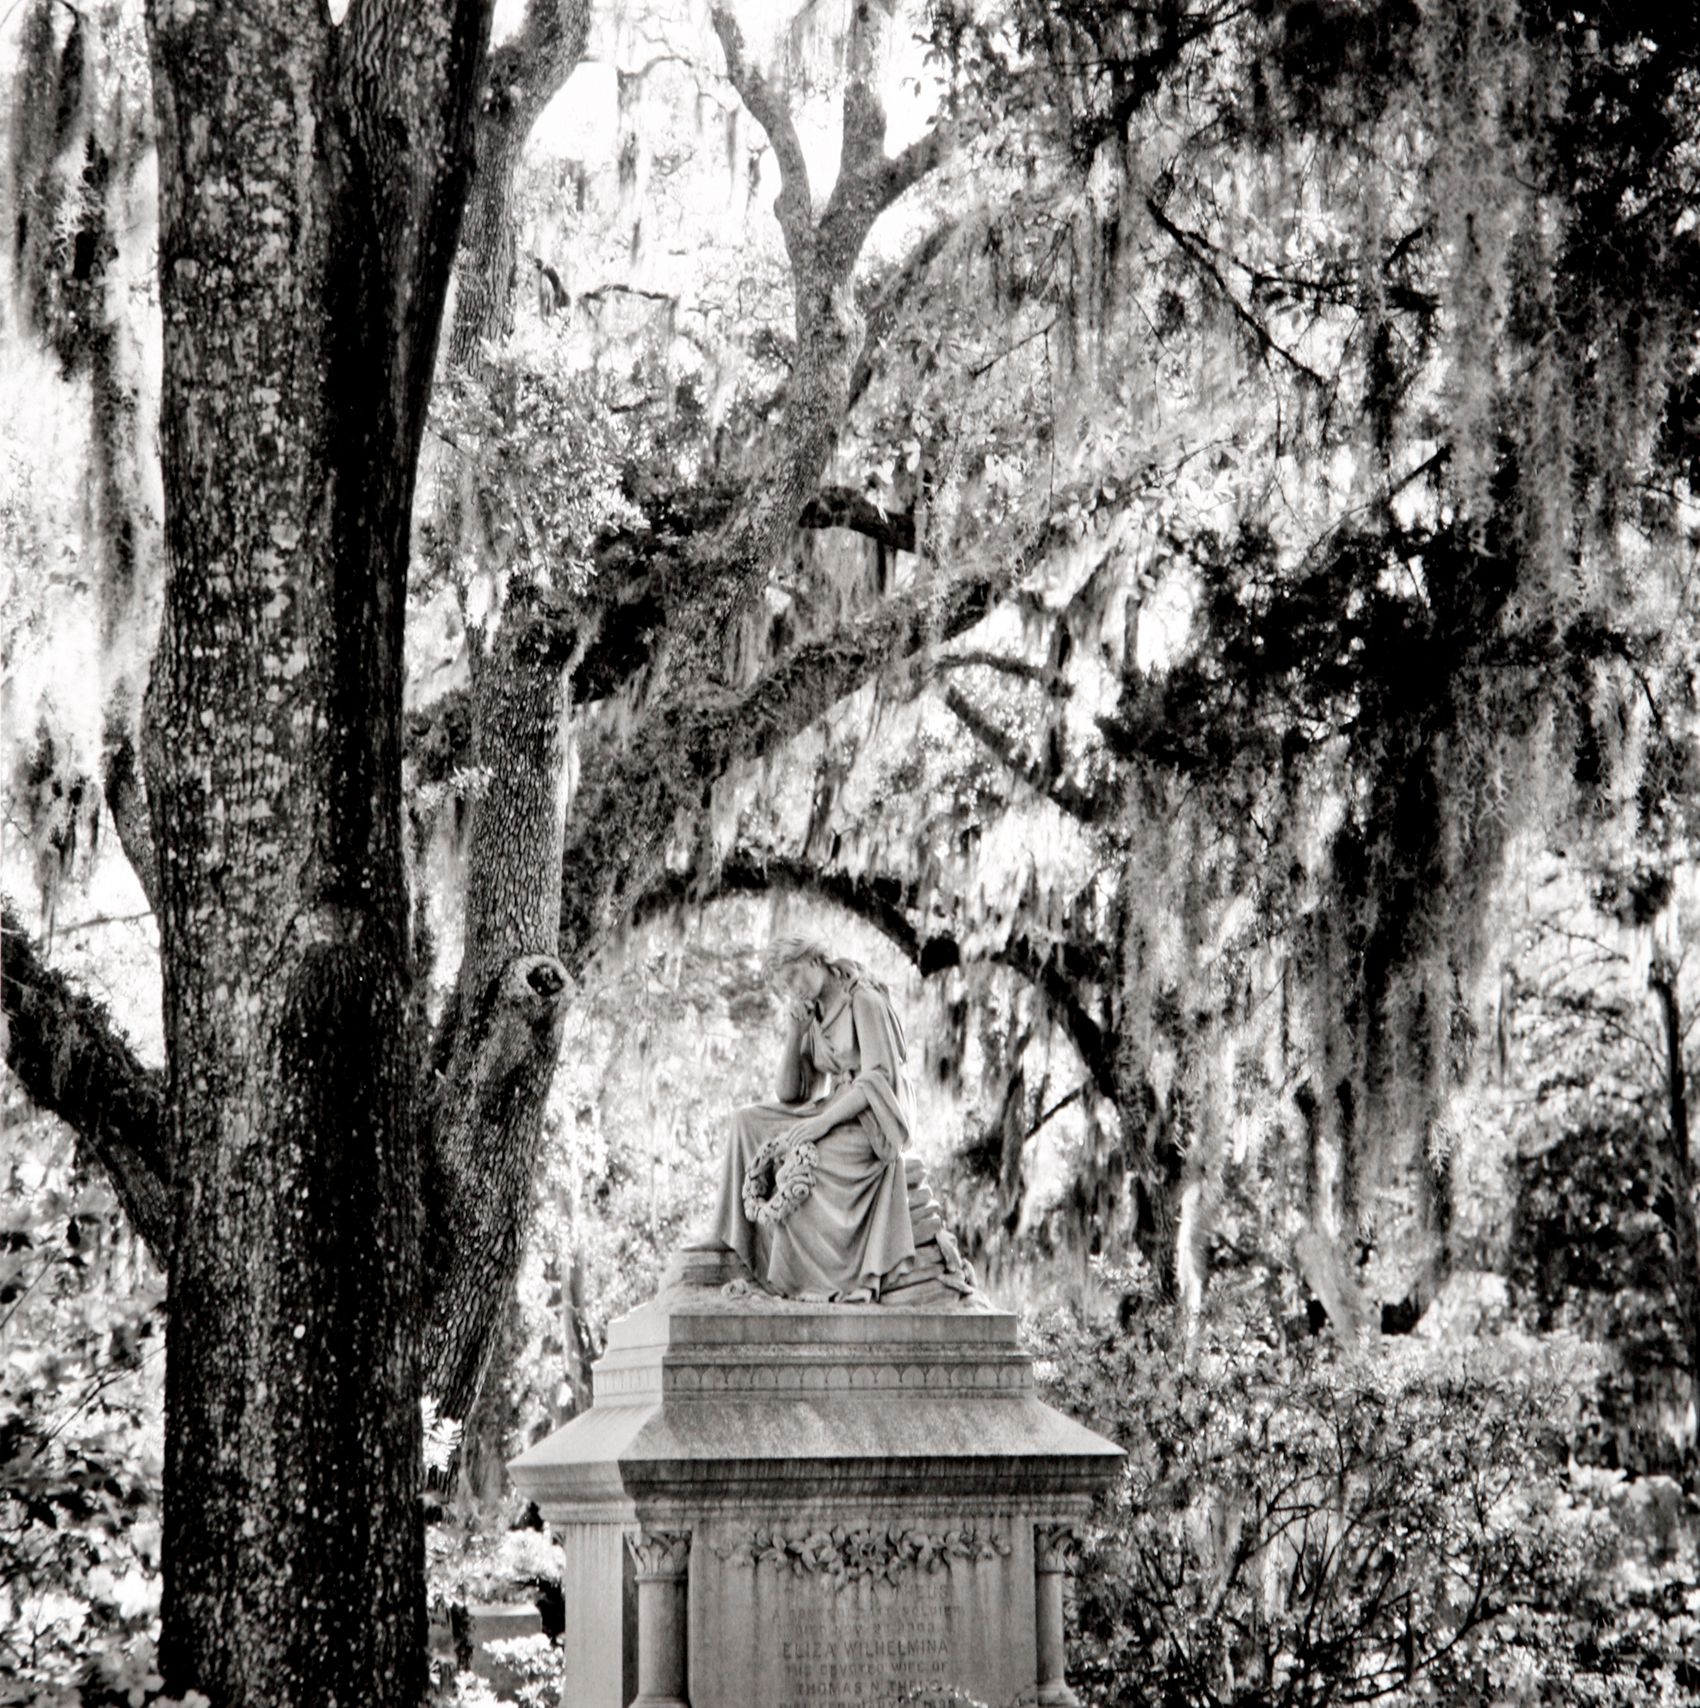 Under Hanging Moss,Bonadventure Cemetery, Savannah,  GA 2005